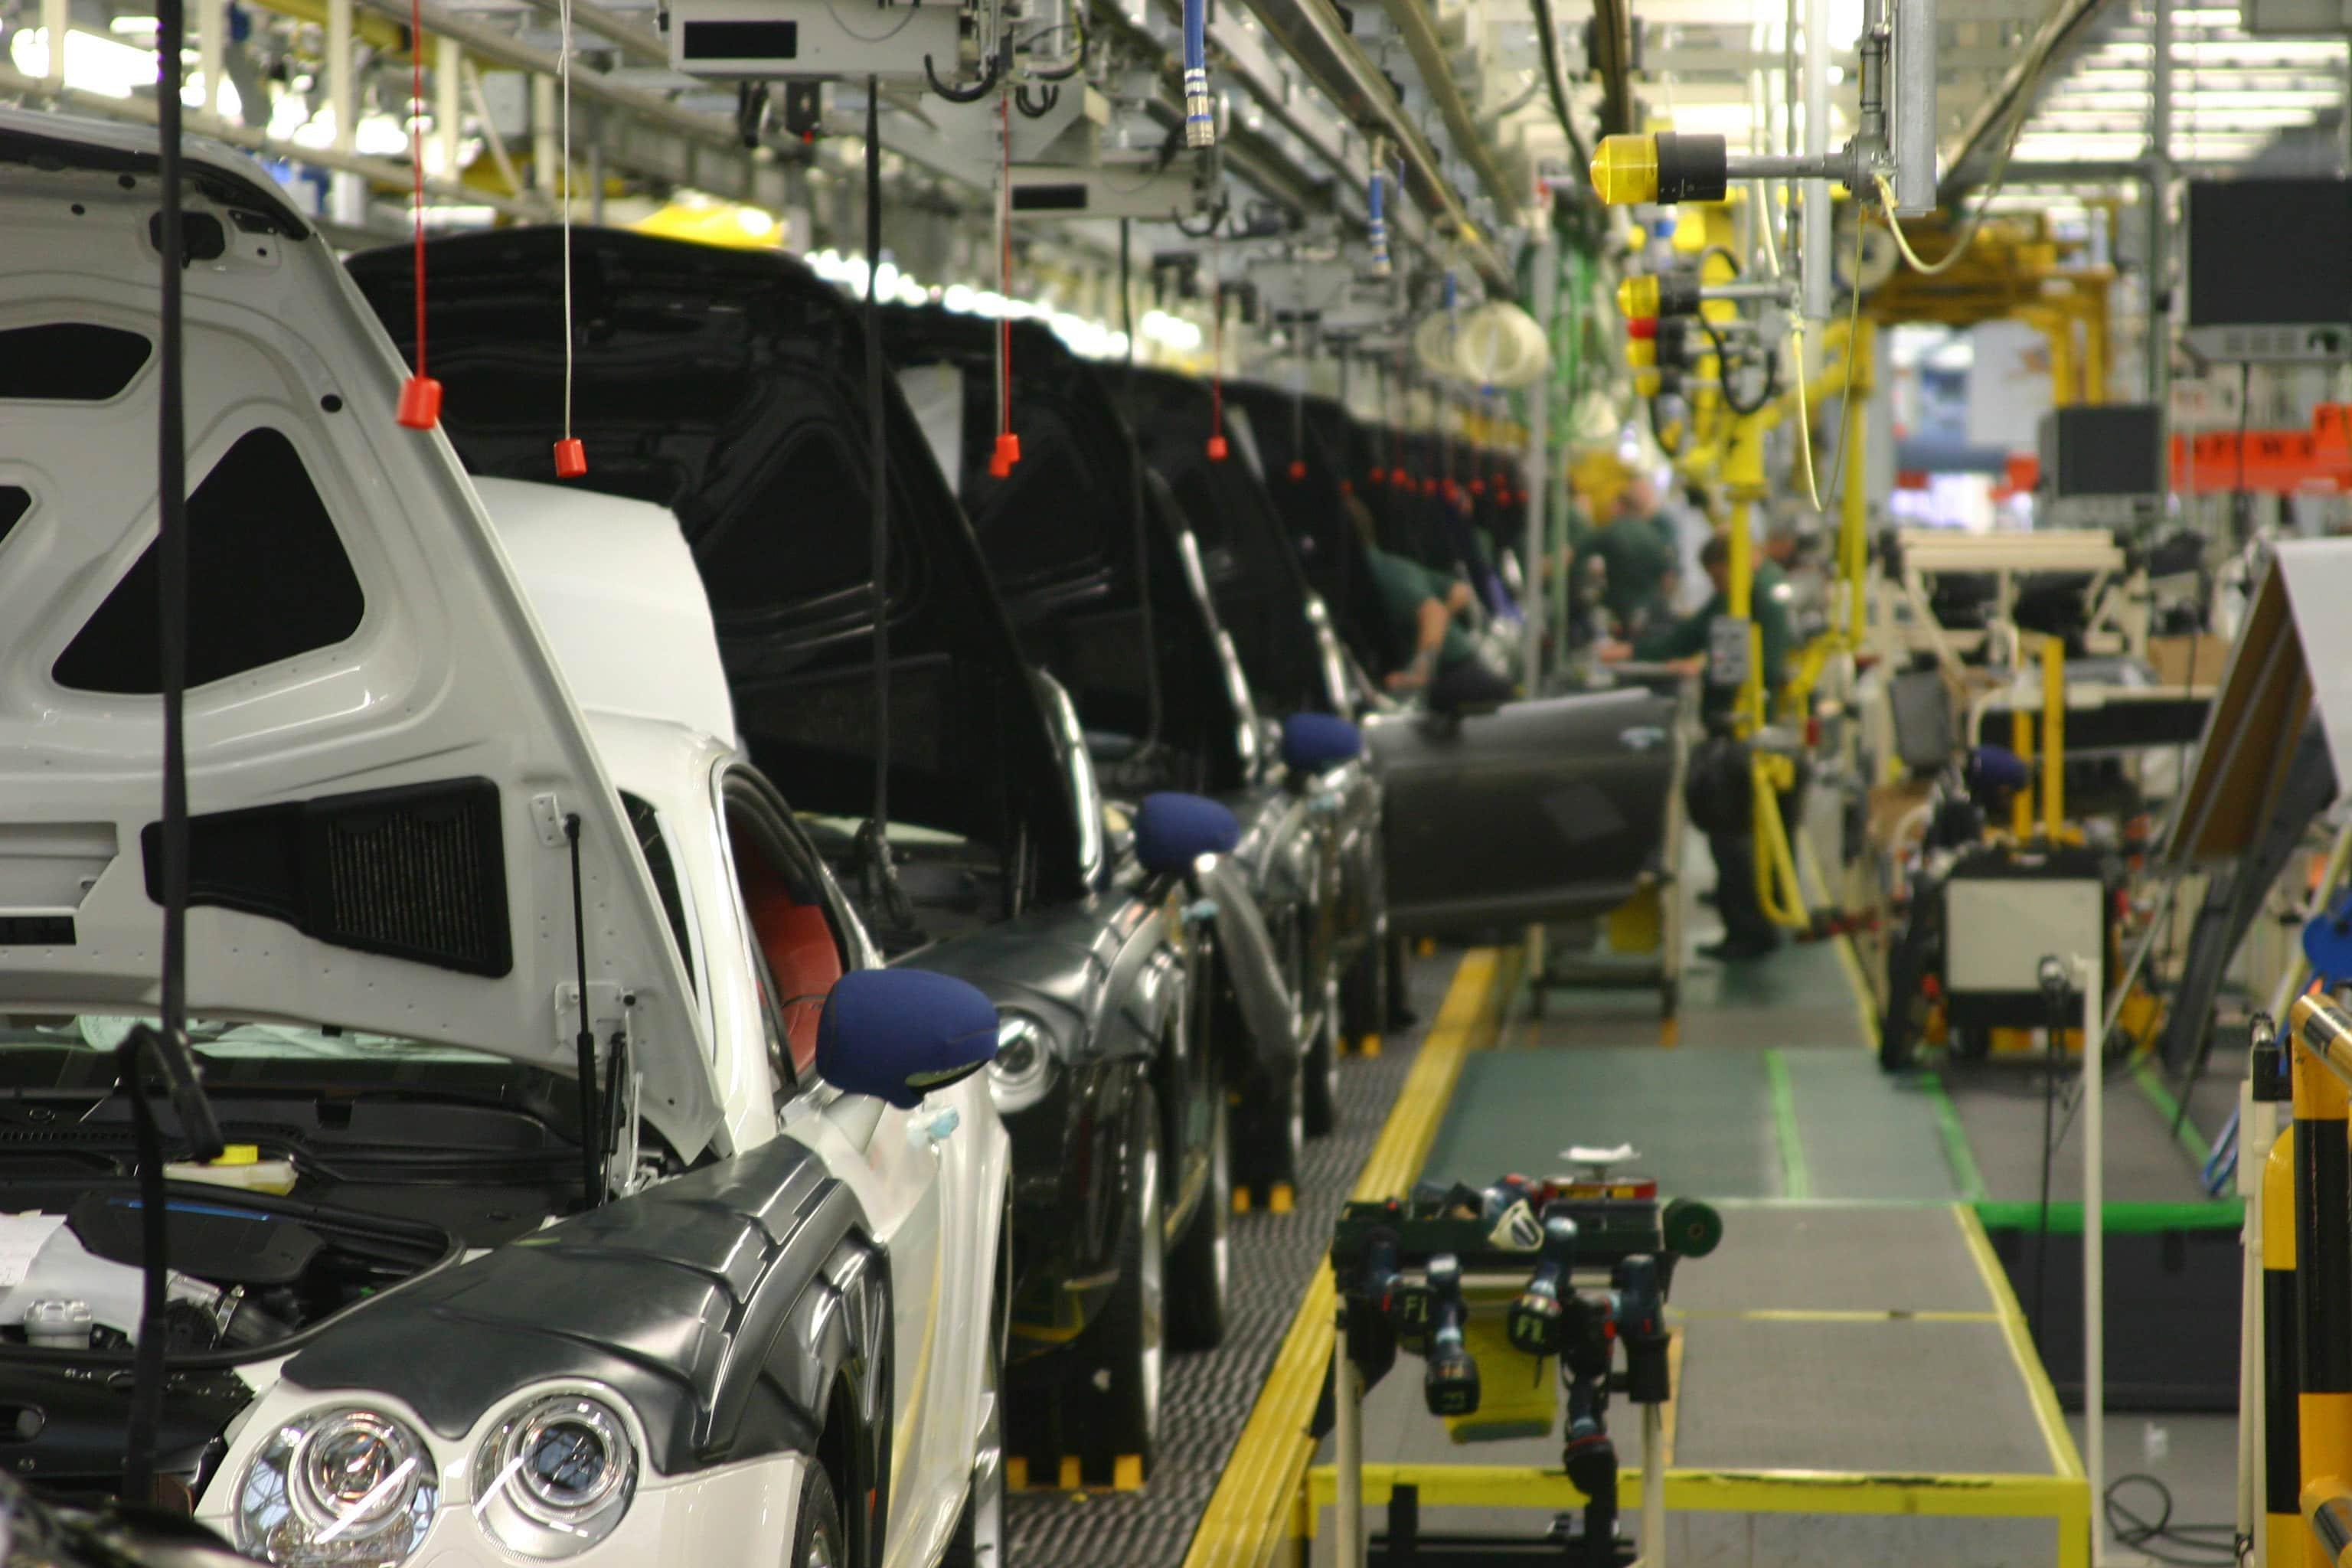 2003 Bentley Production line.